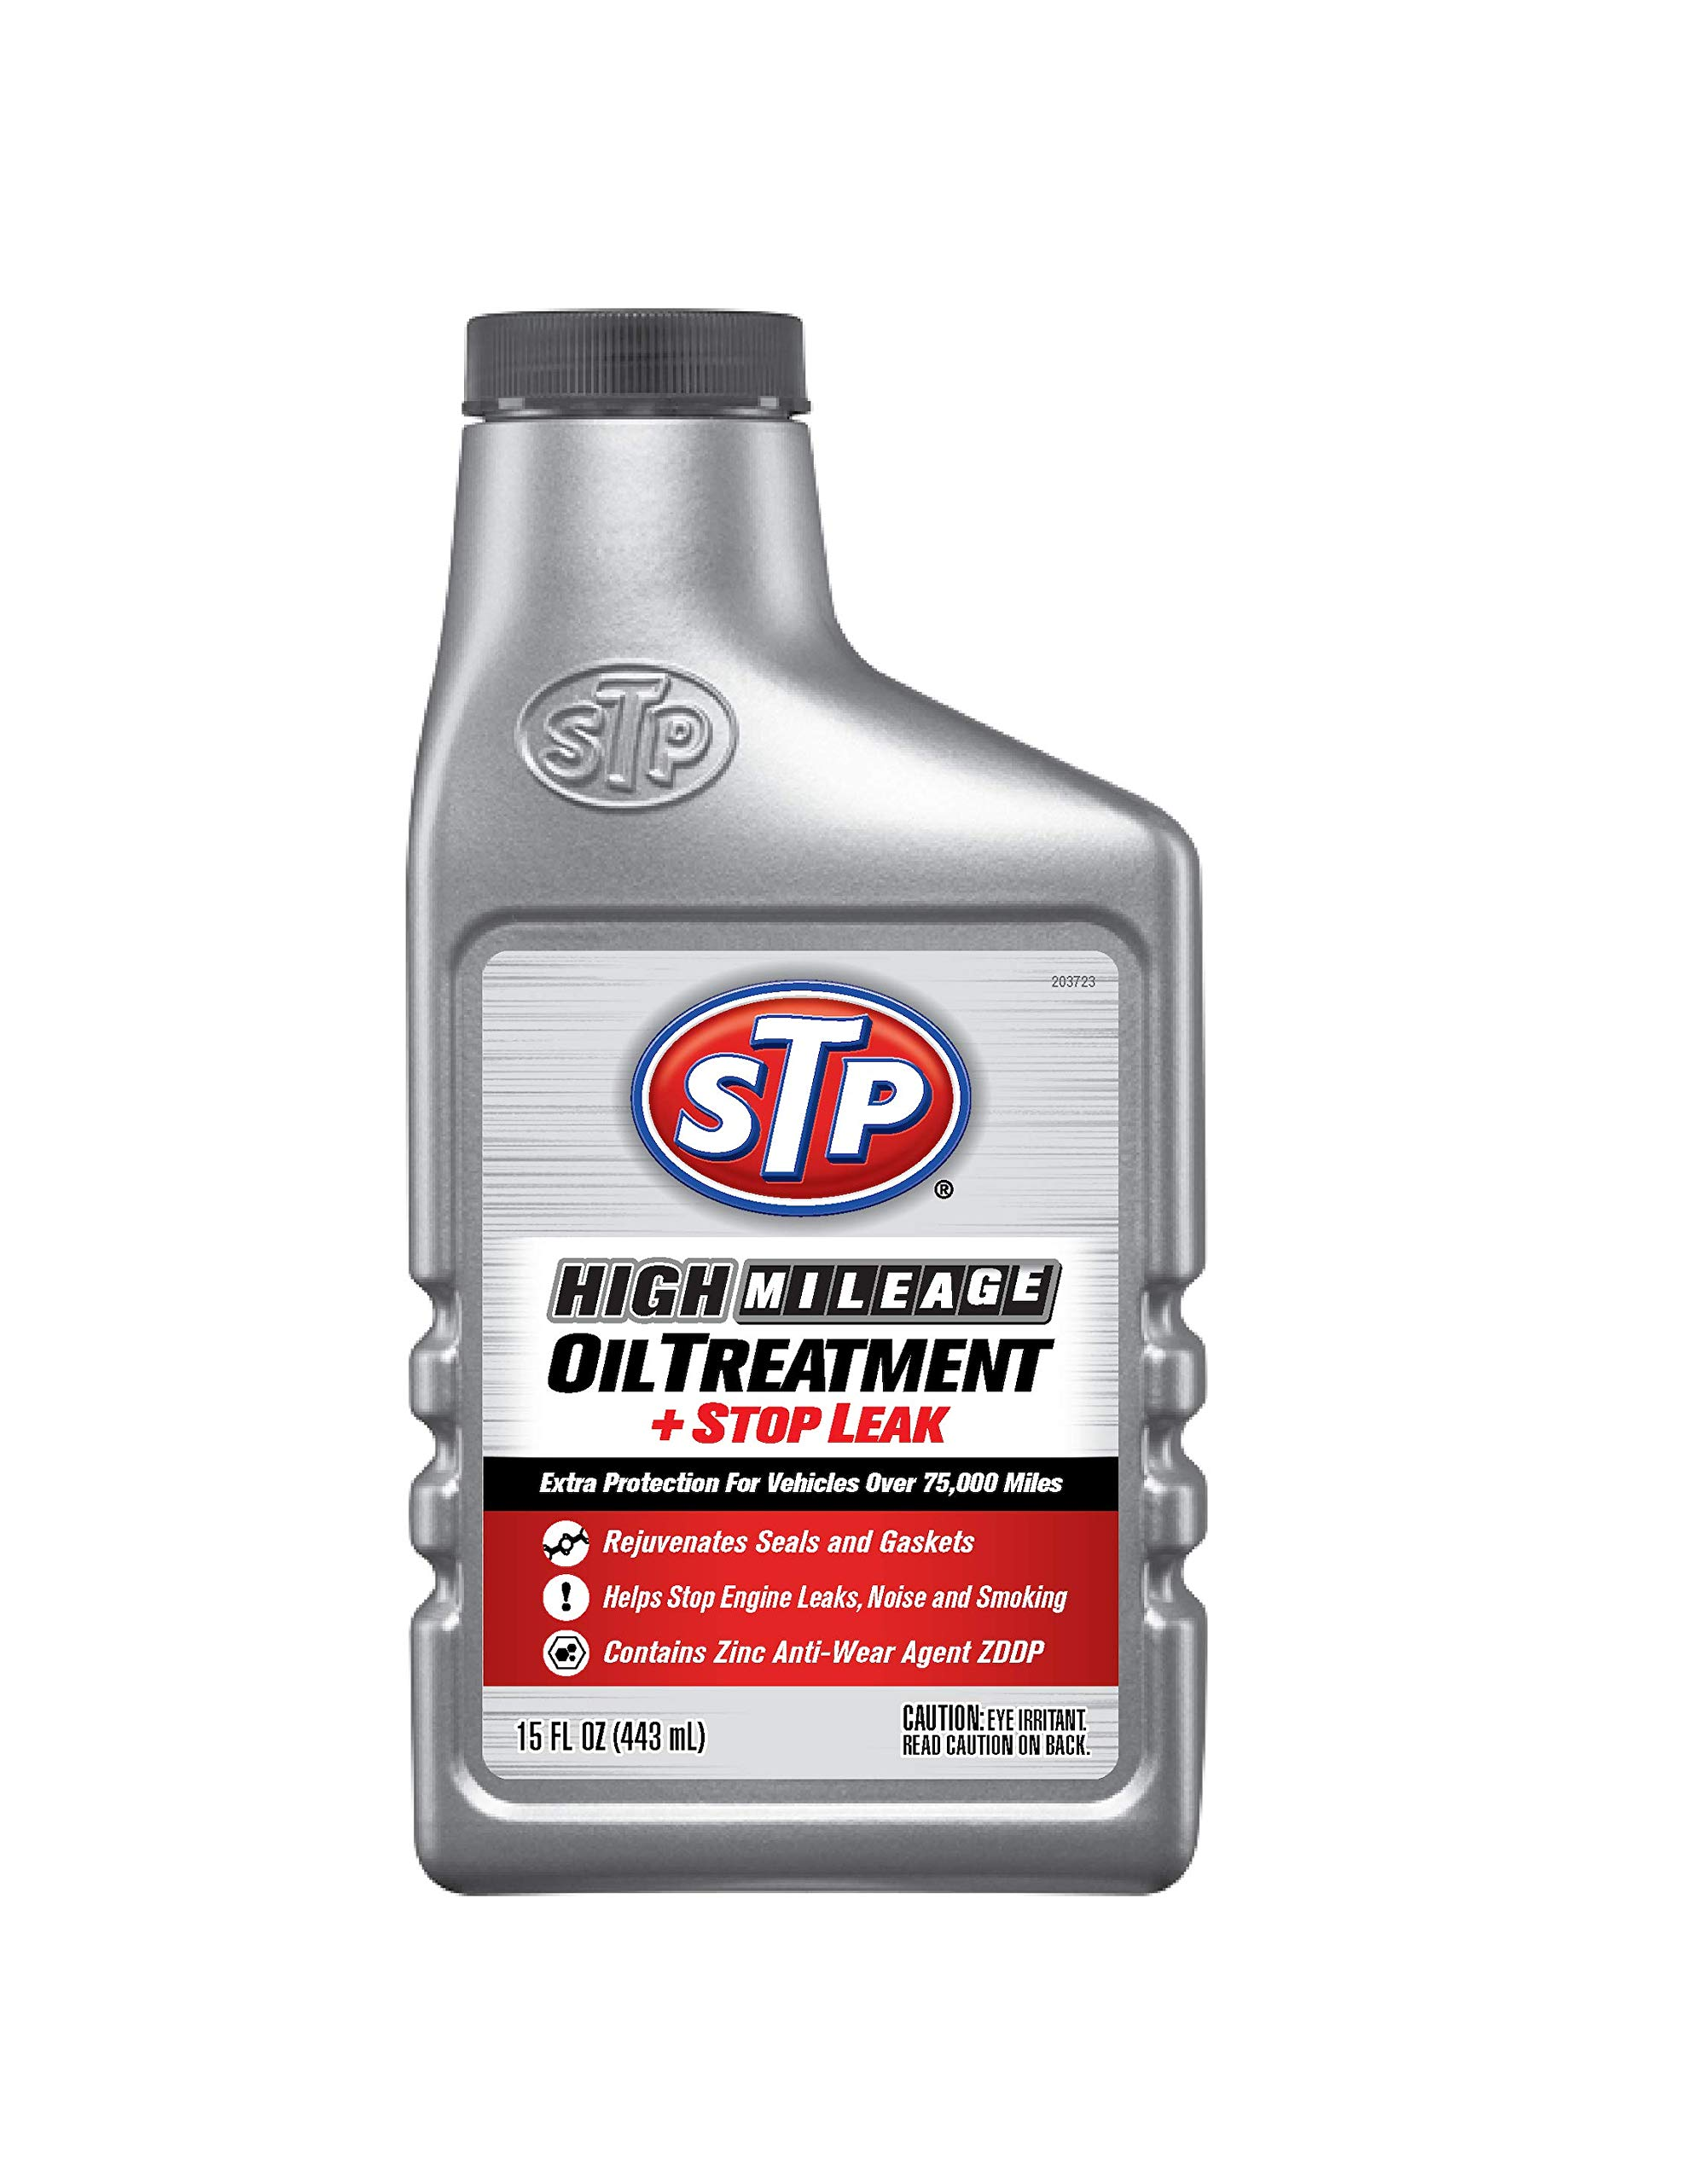 STP High Mileage Oil Treatment, Formula for Cars & Truck, Stop Leak, Bottles, 15 Fl Oz, 15604B